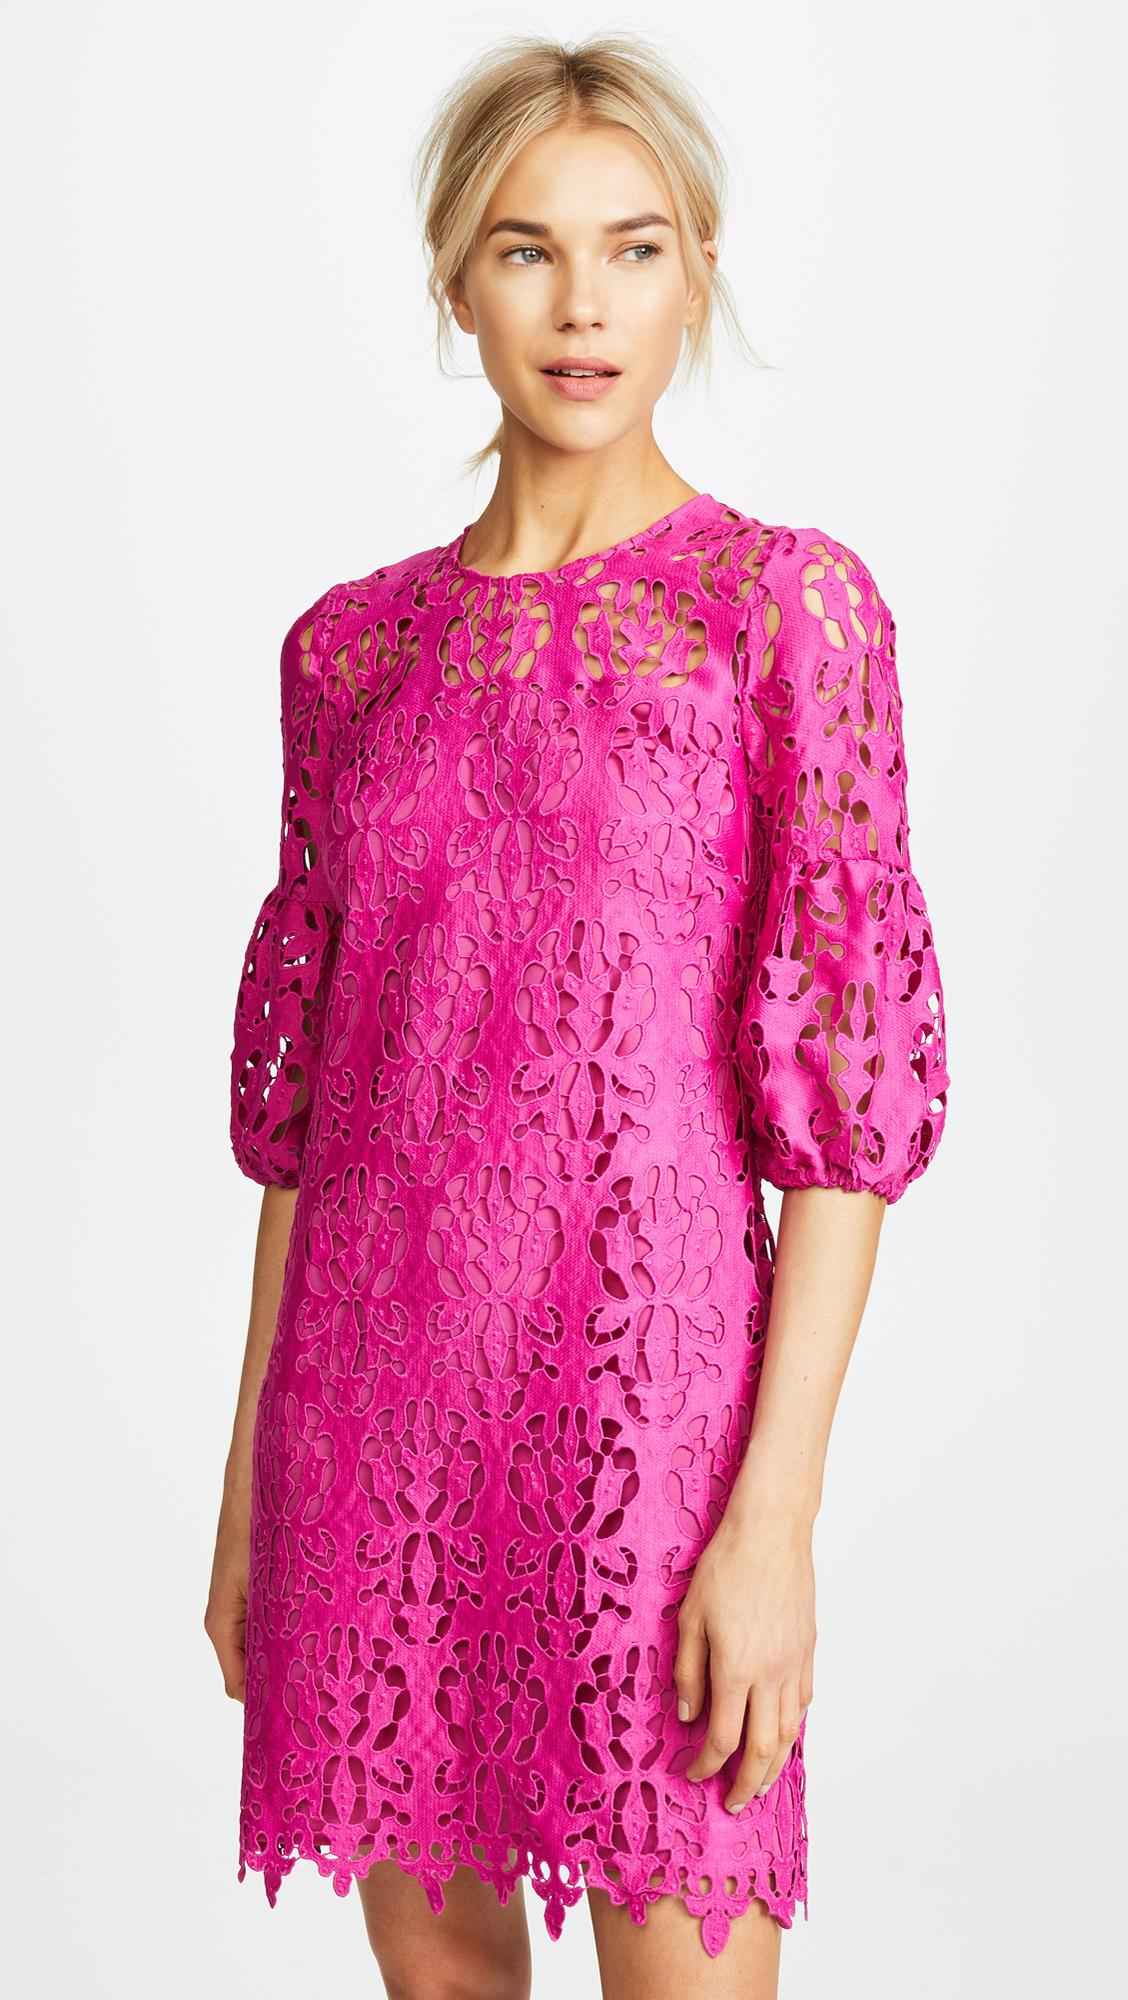 Shoshanna Vina Dress Shopbop Save Up To 25 Use Code More19